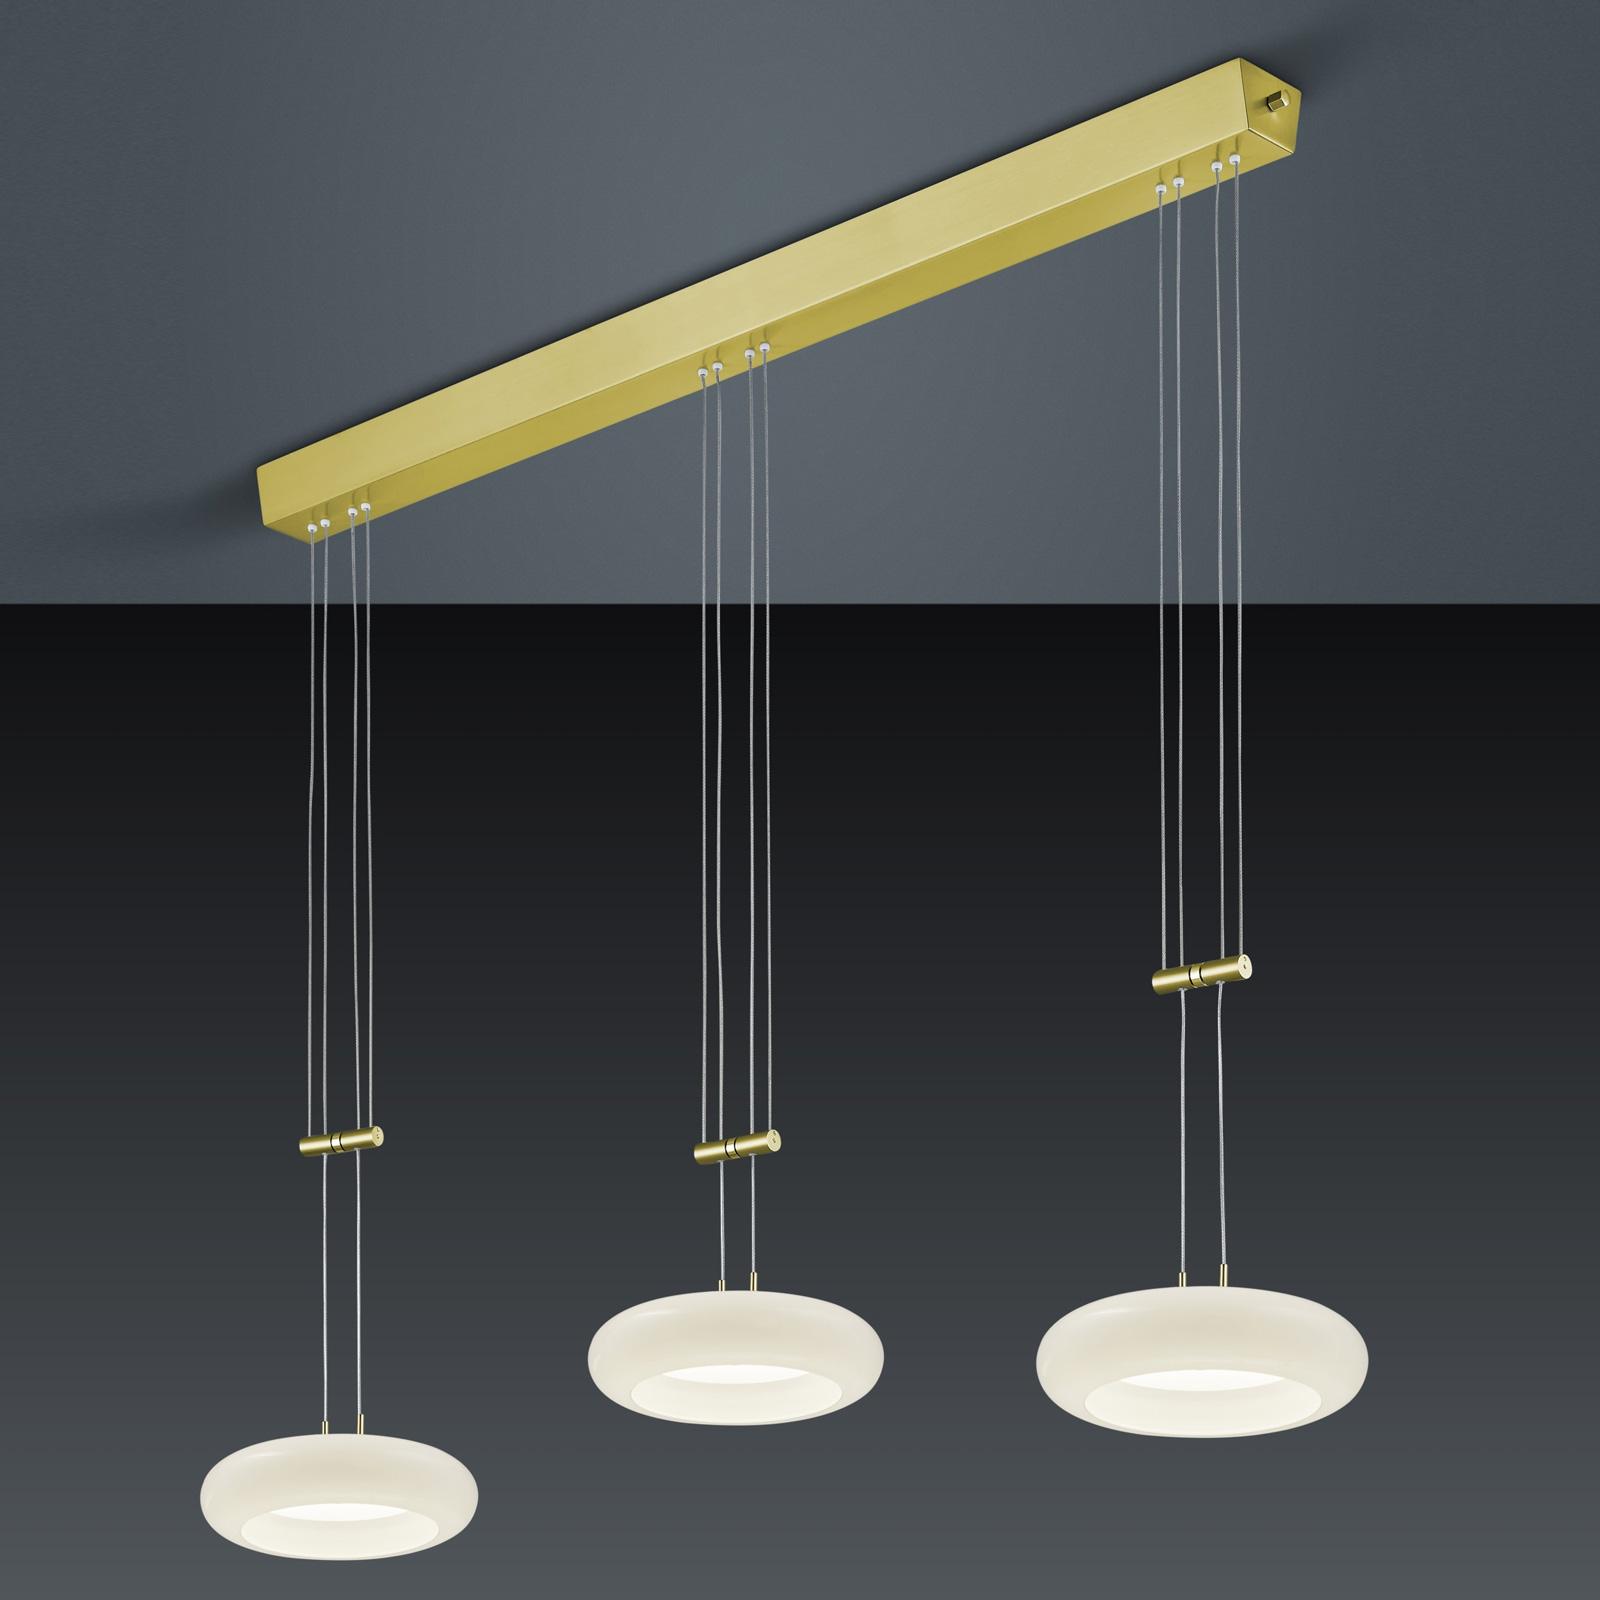 Acquista BANKAMP Centa sospensione LED 3 luci